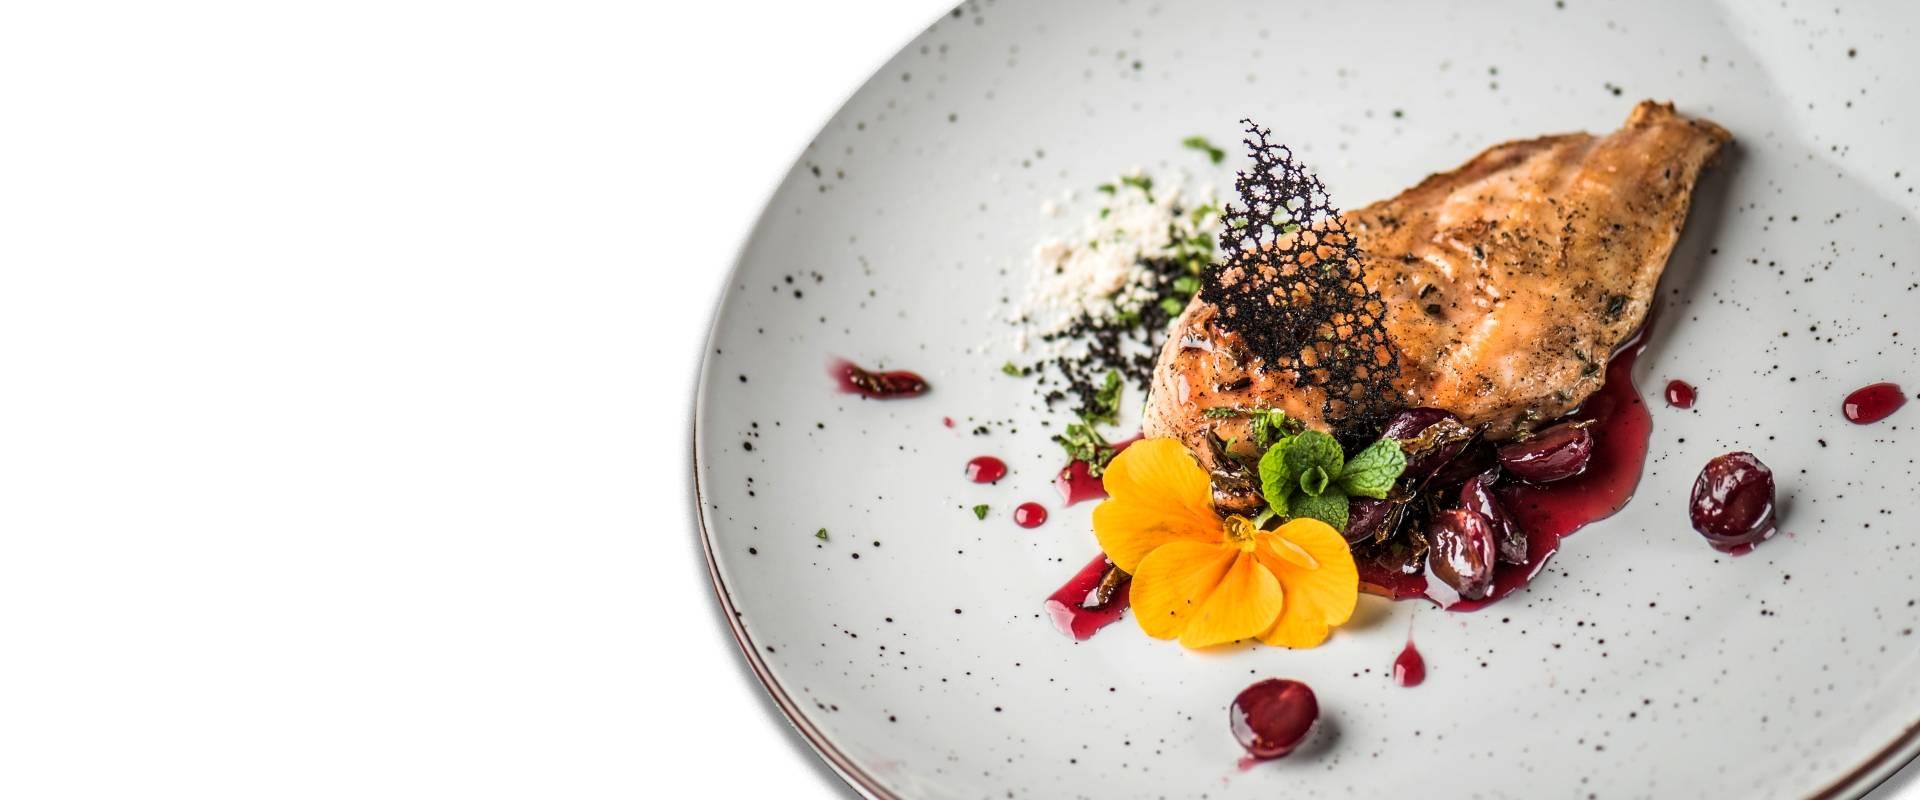 Кулинарная школа <br> онлайн обучение